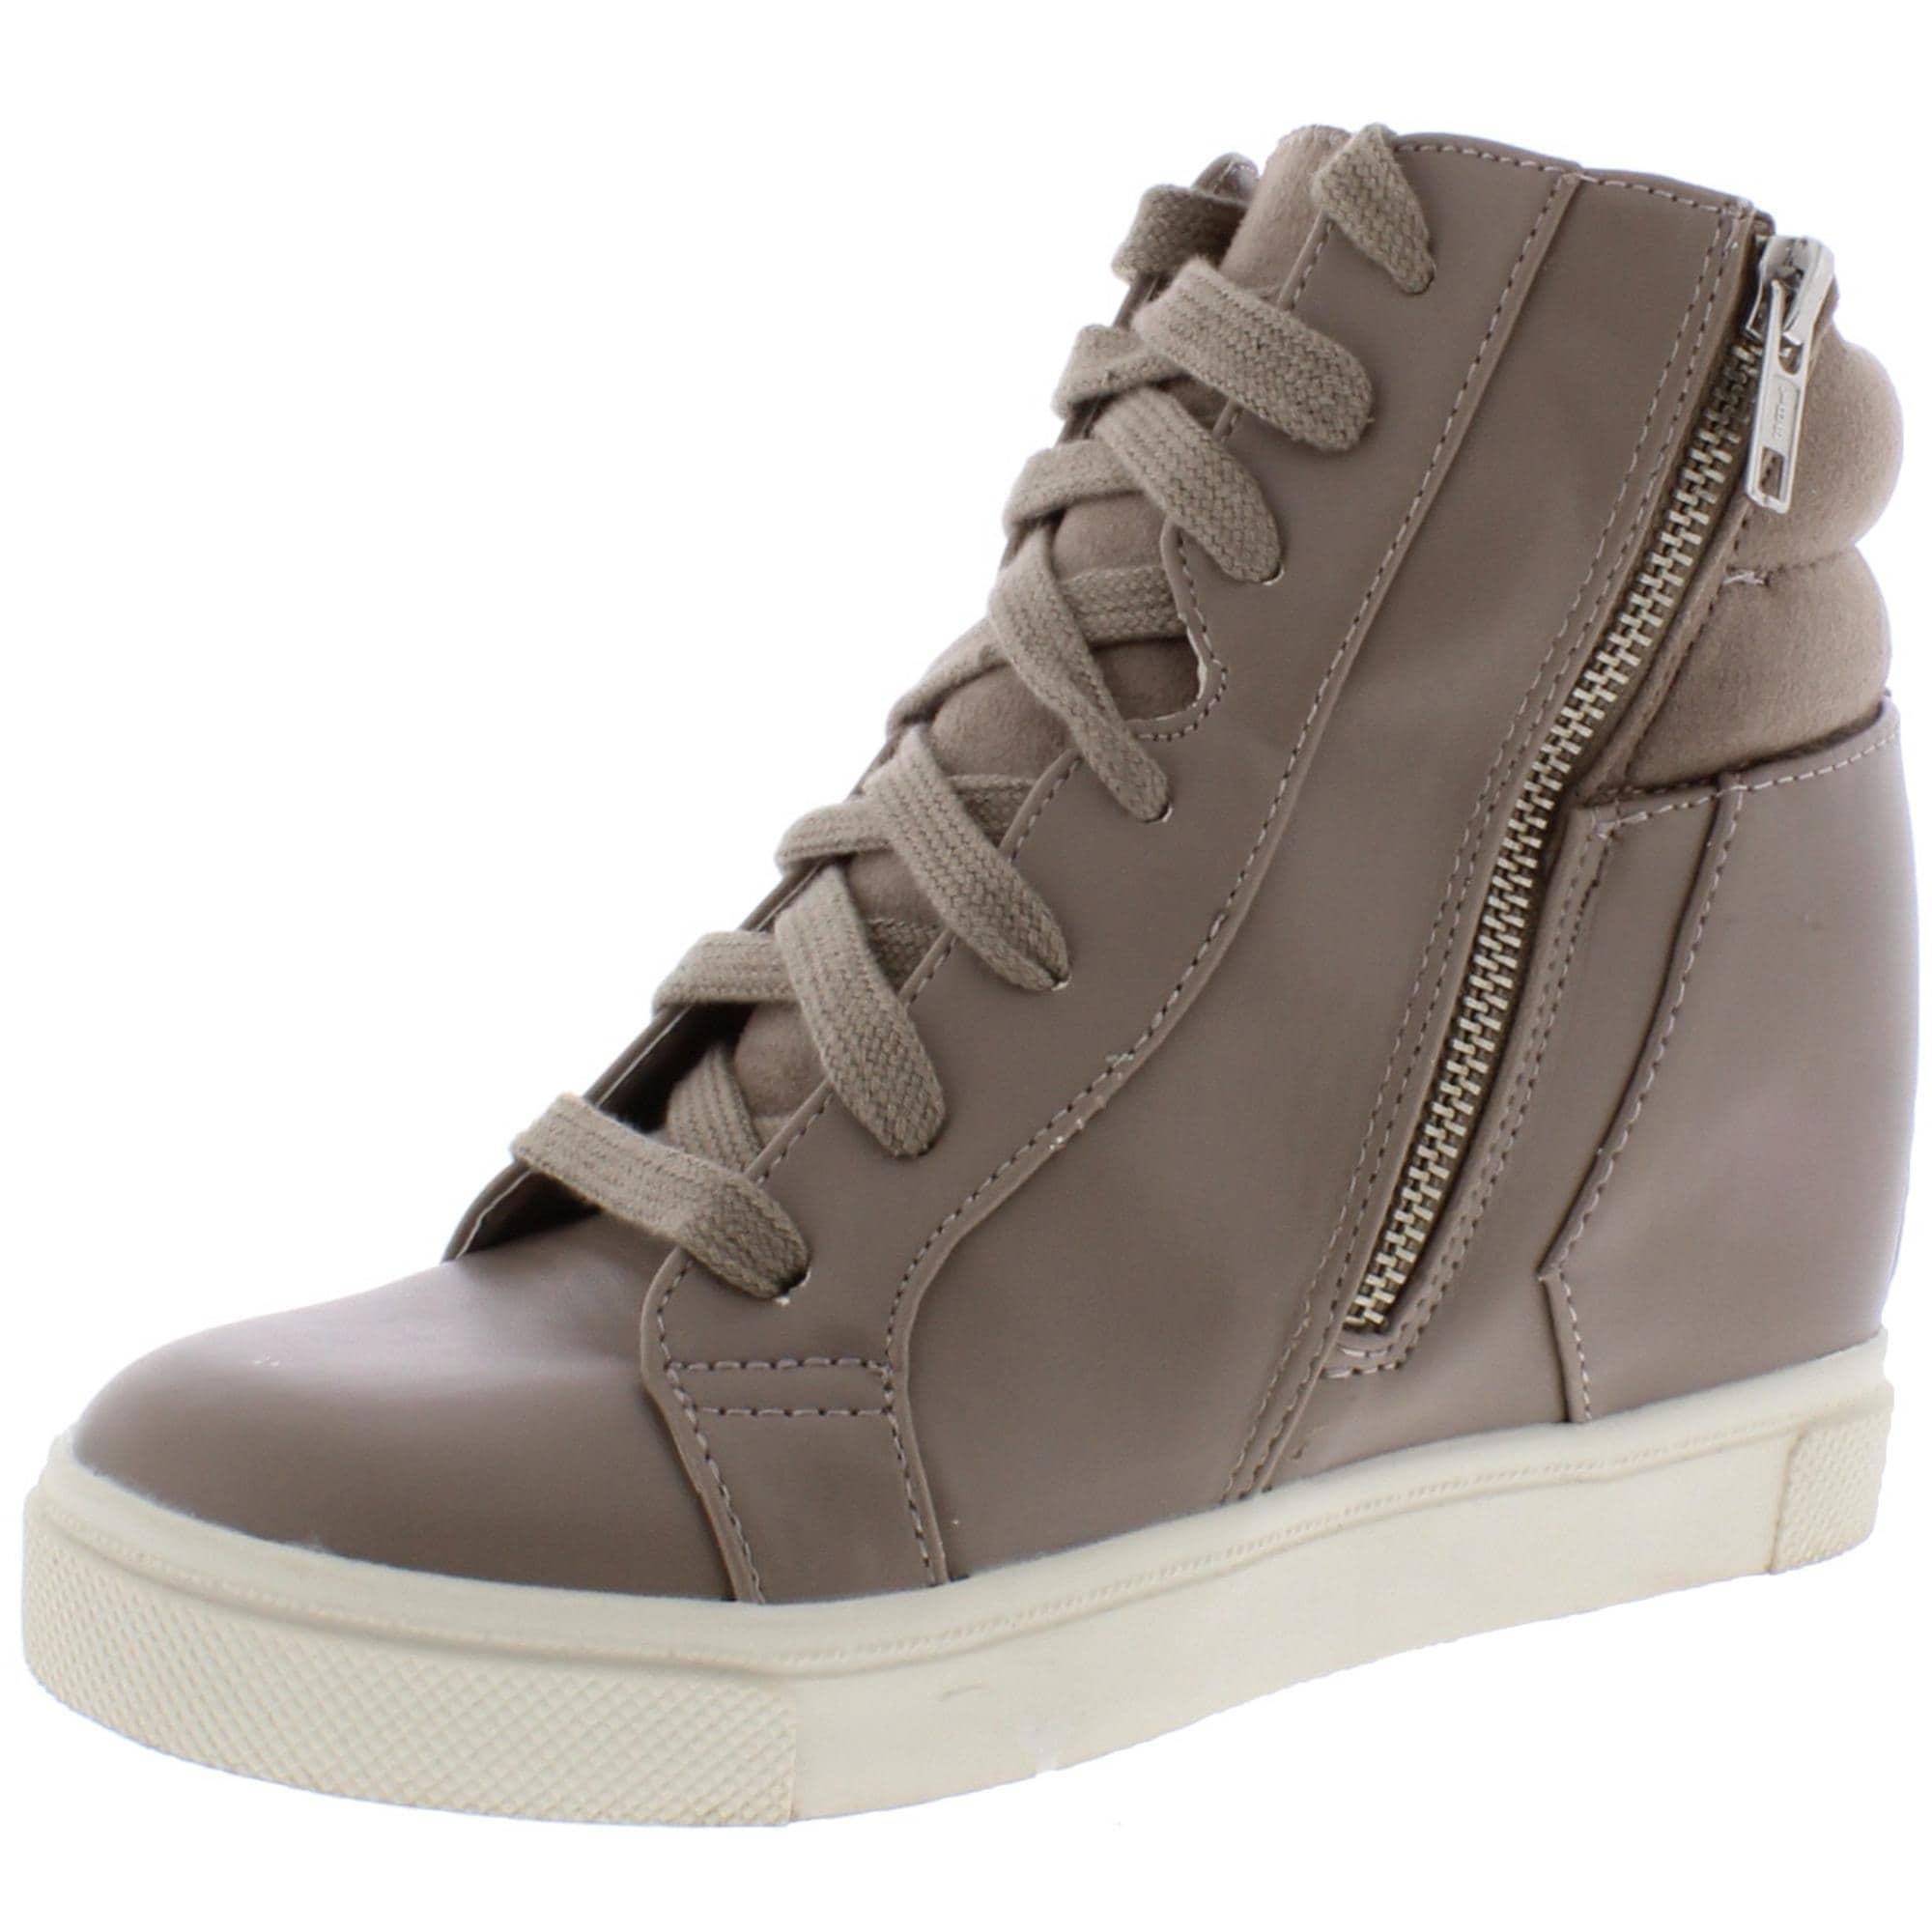 steve madden sneakers on sale